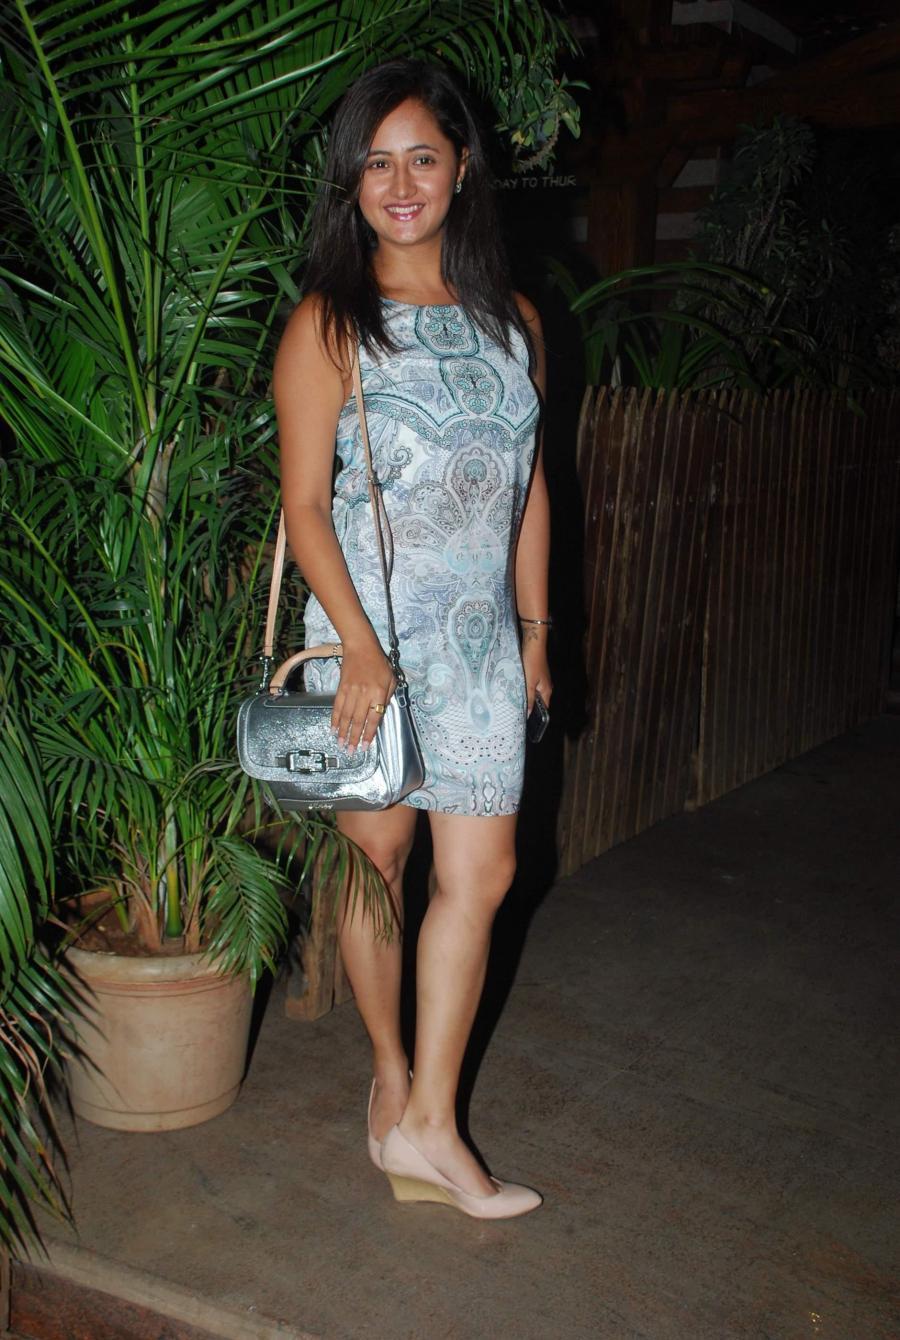 Hindi TV Actress Rashami Desai Long Legs Stills In Green Top